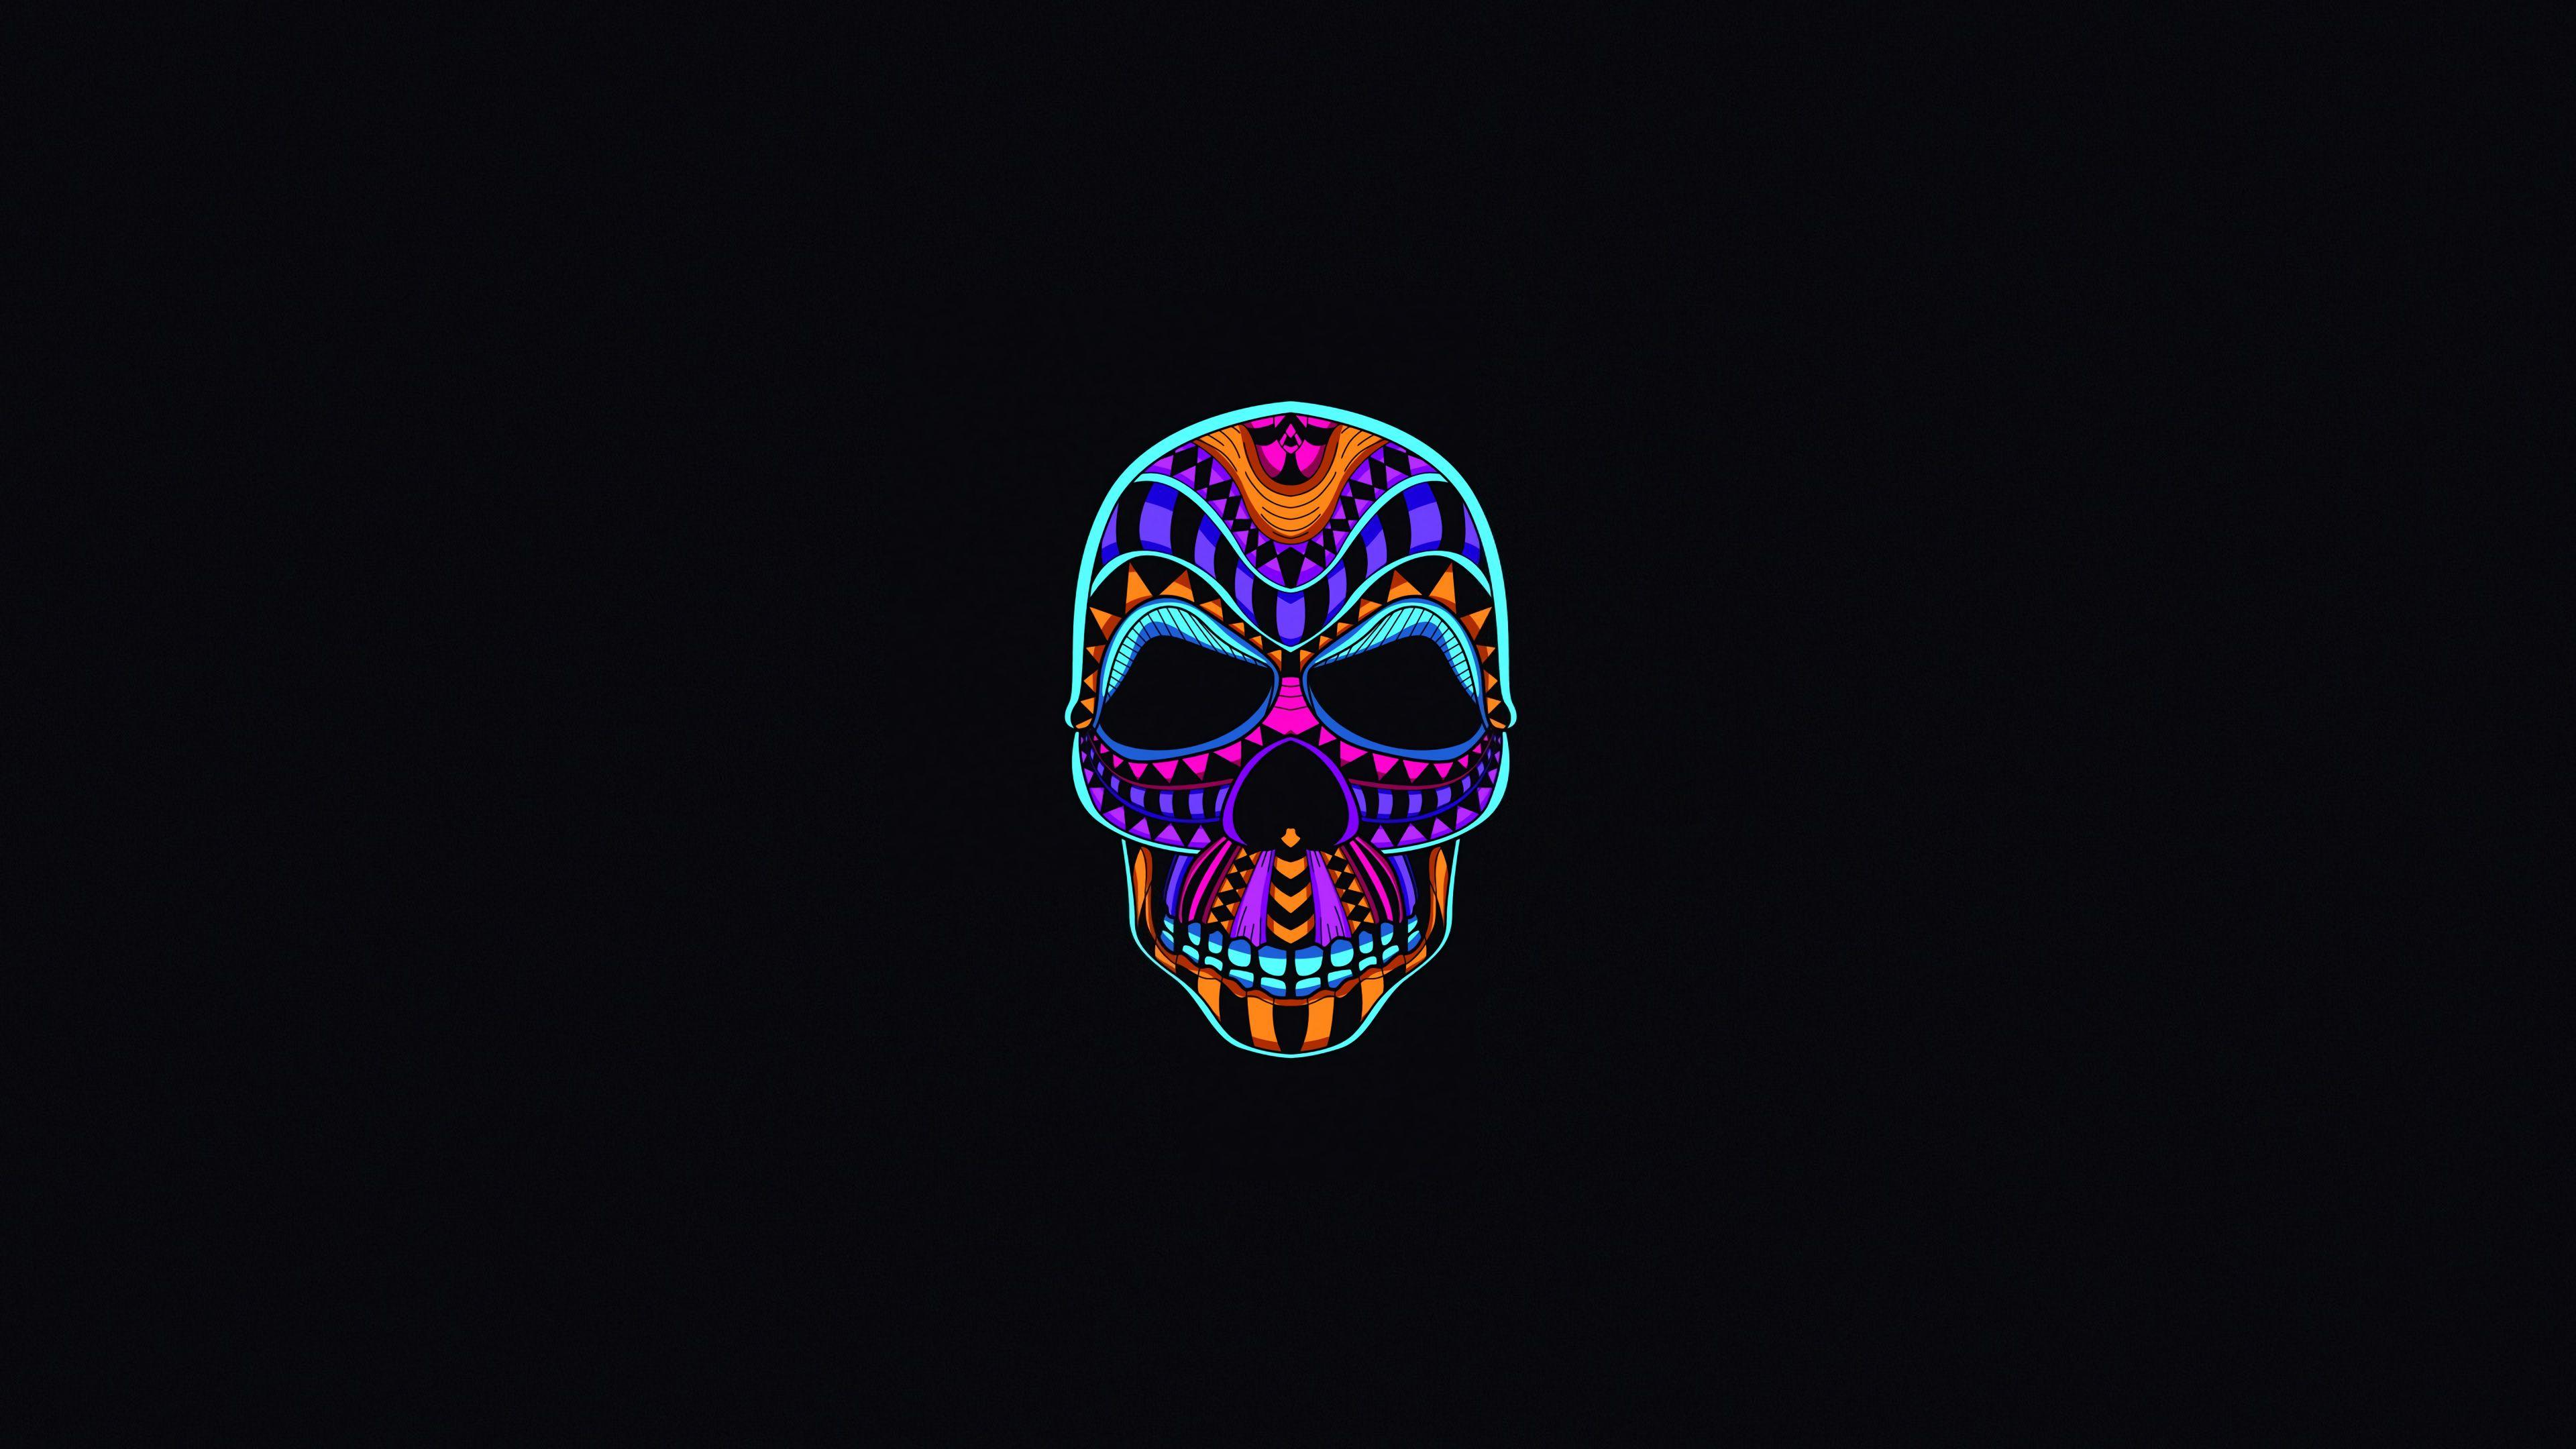 Skull Dark Minimal skull wallpapers oled wallpapers minimalist 3840x2160